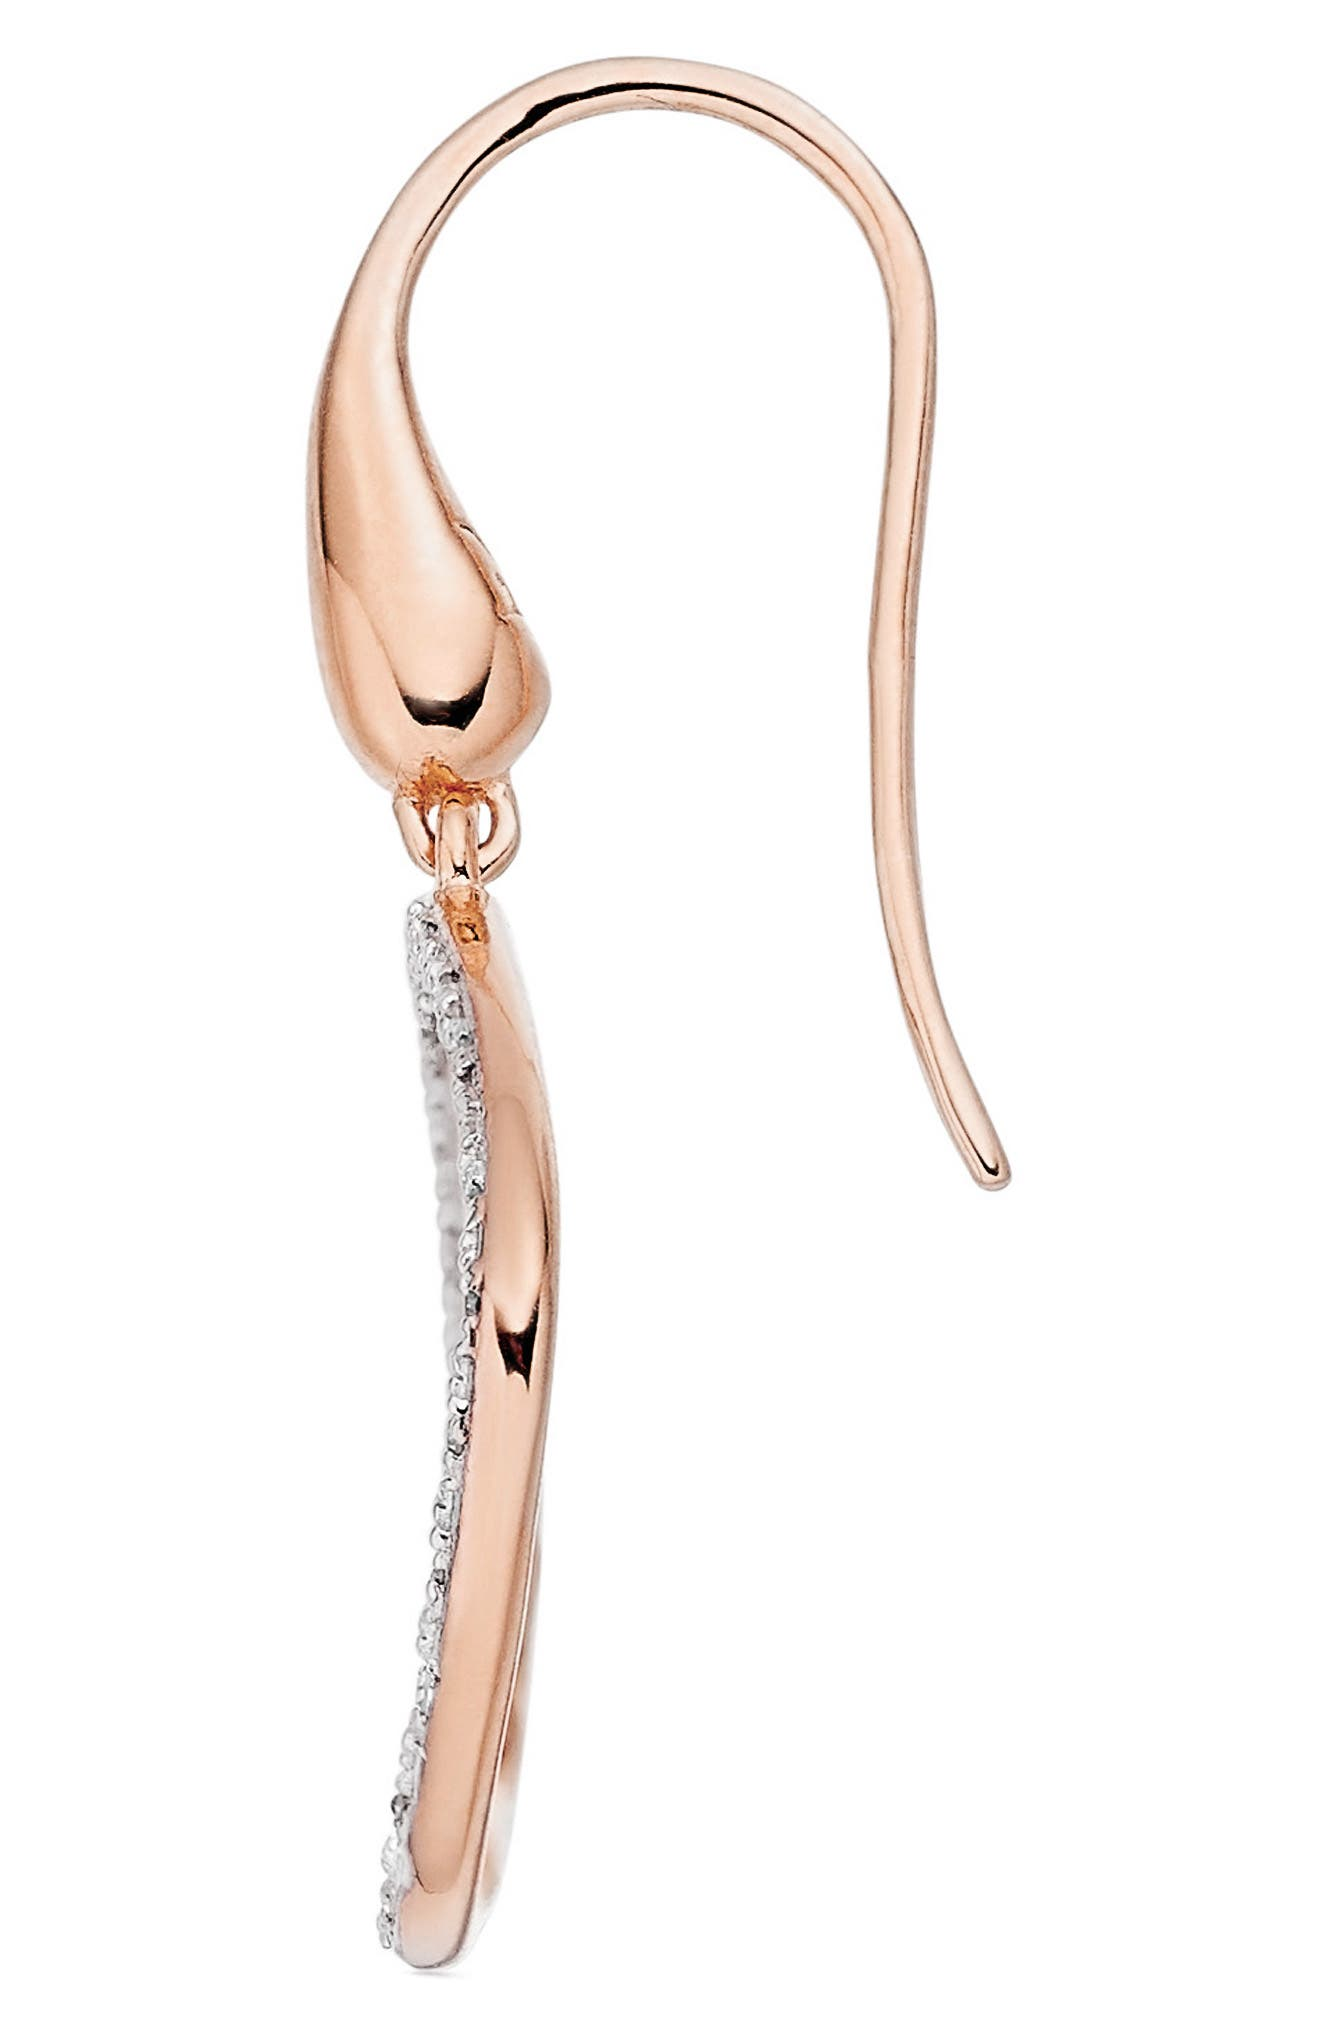 Riva Diamond Hoop Drop Earrings,                             Alternate thumbnail 3, color,                             ROSE GOLD